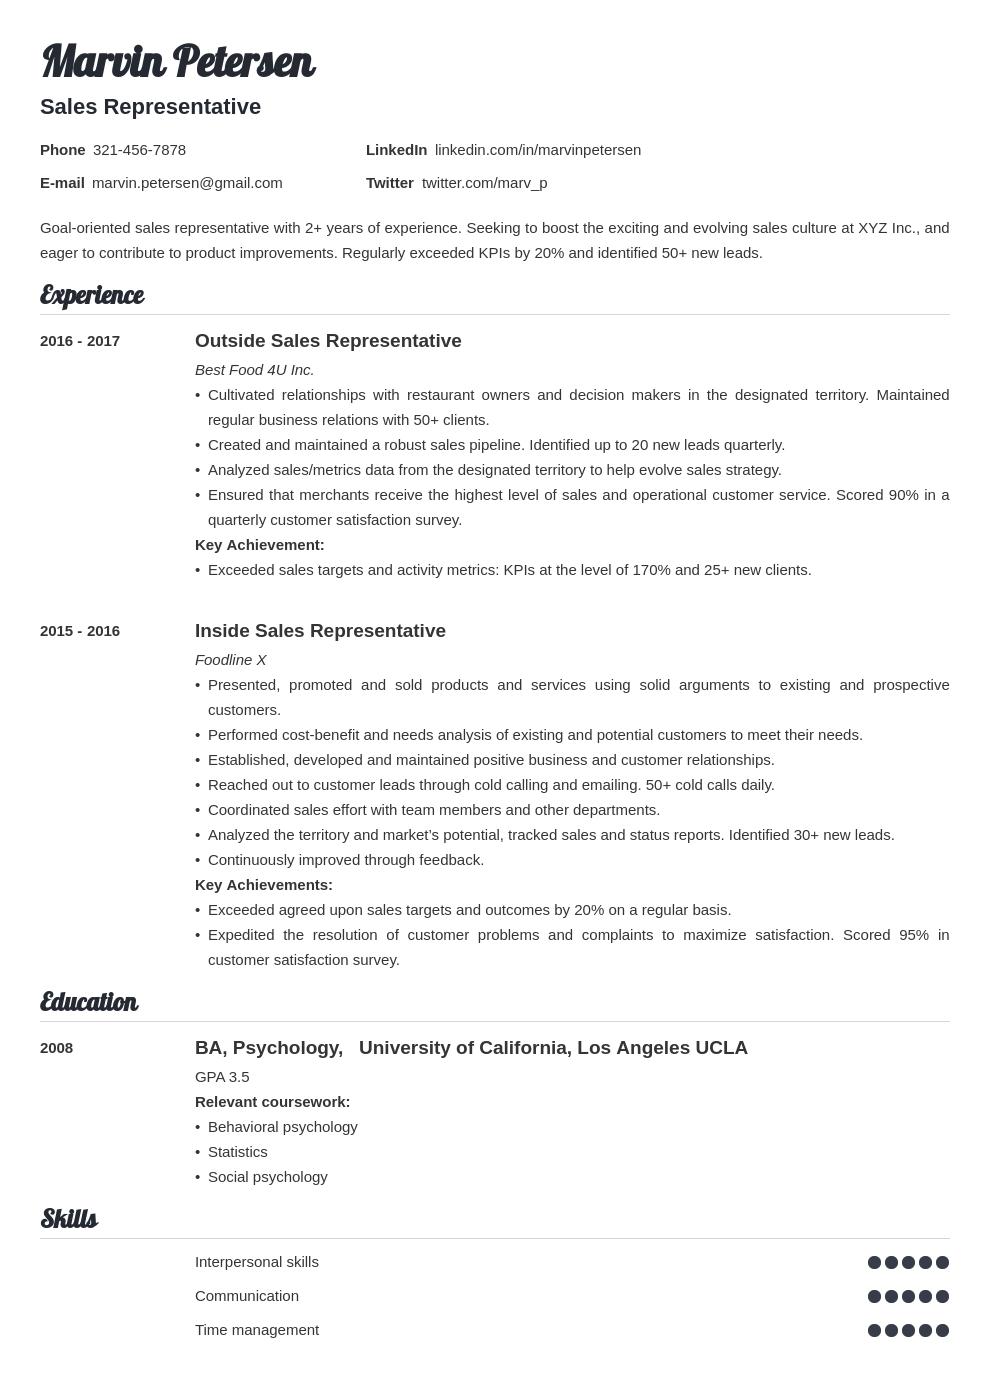 sales representative template valera